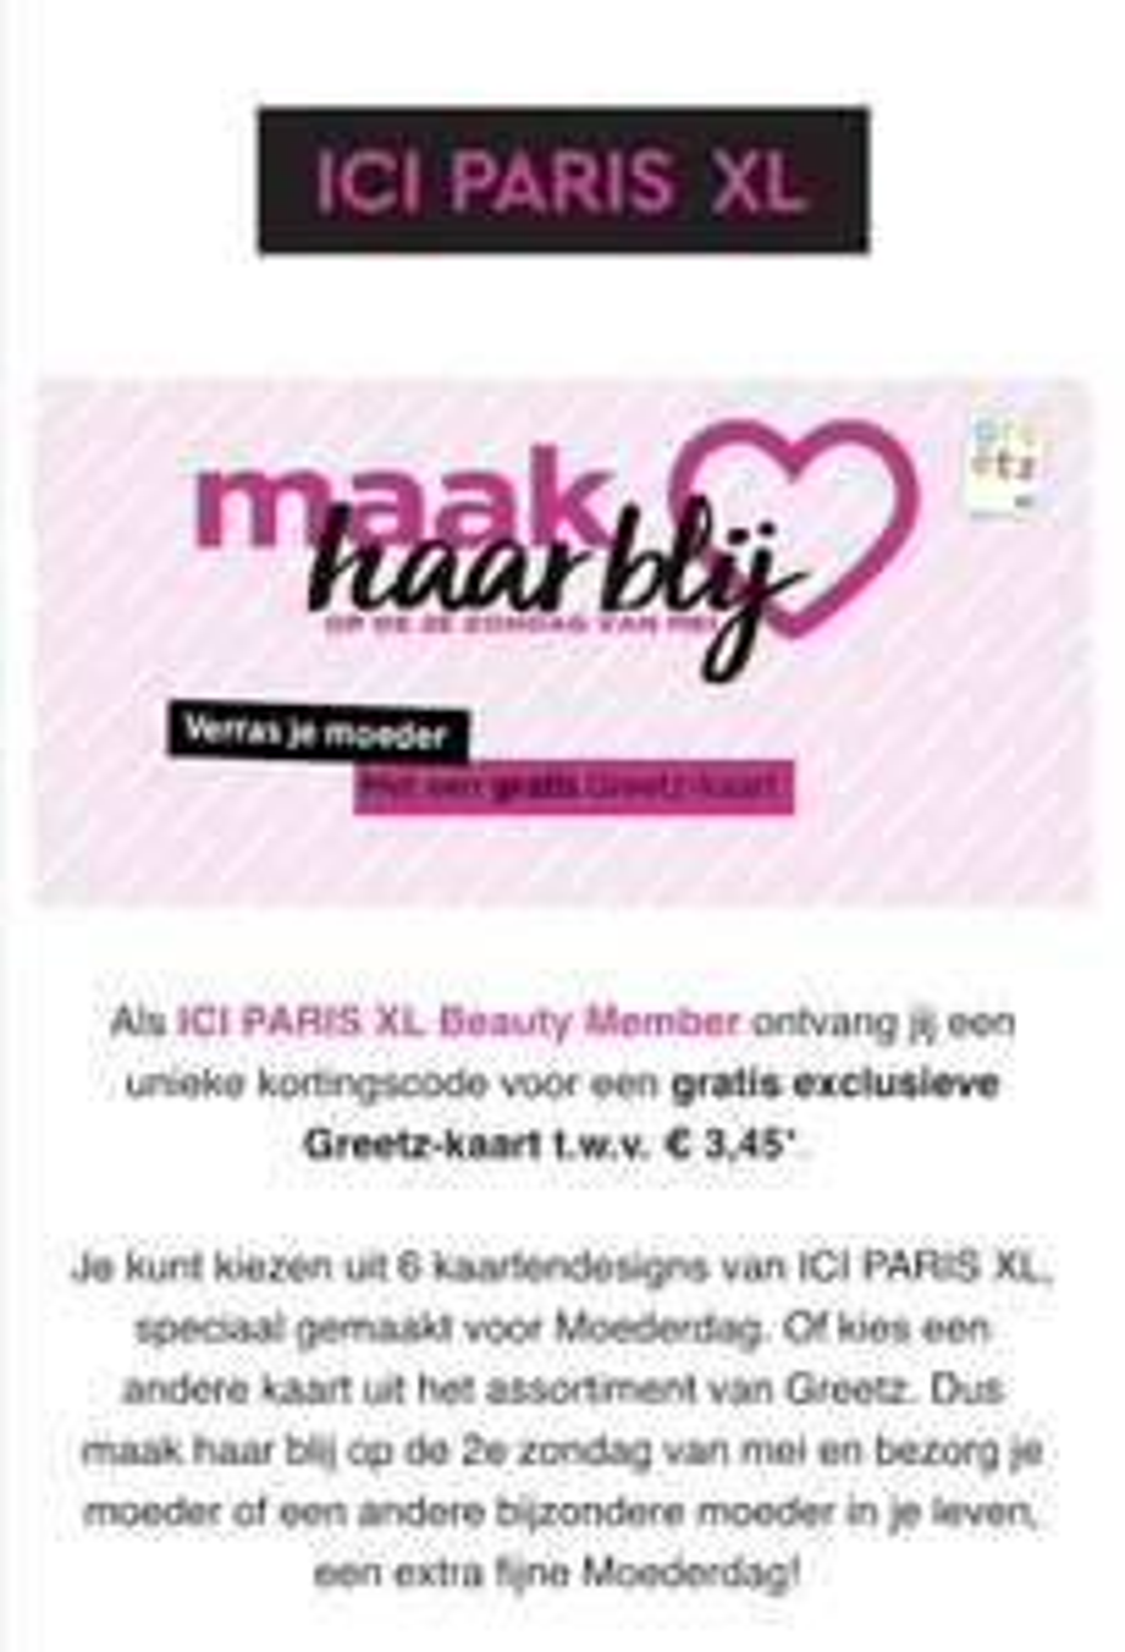 Gratis exclusieve Greetz-kaart t.w.v. €3,45 via ICI PARIS